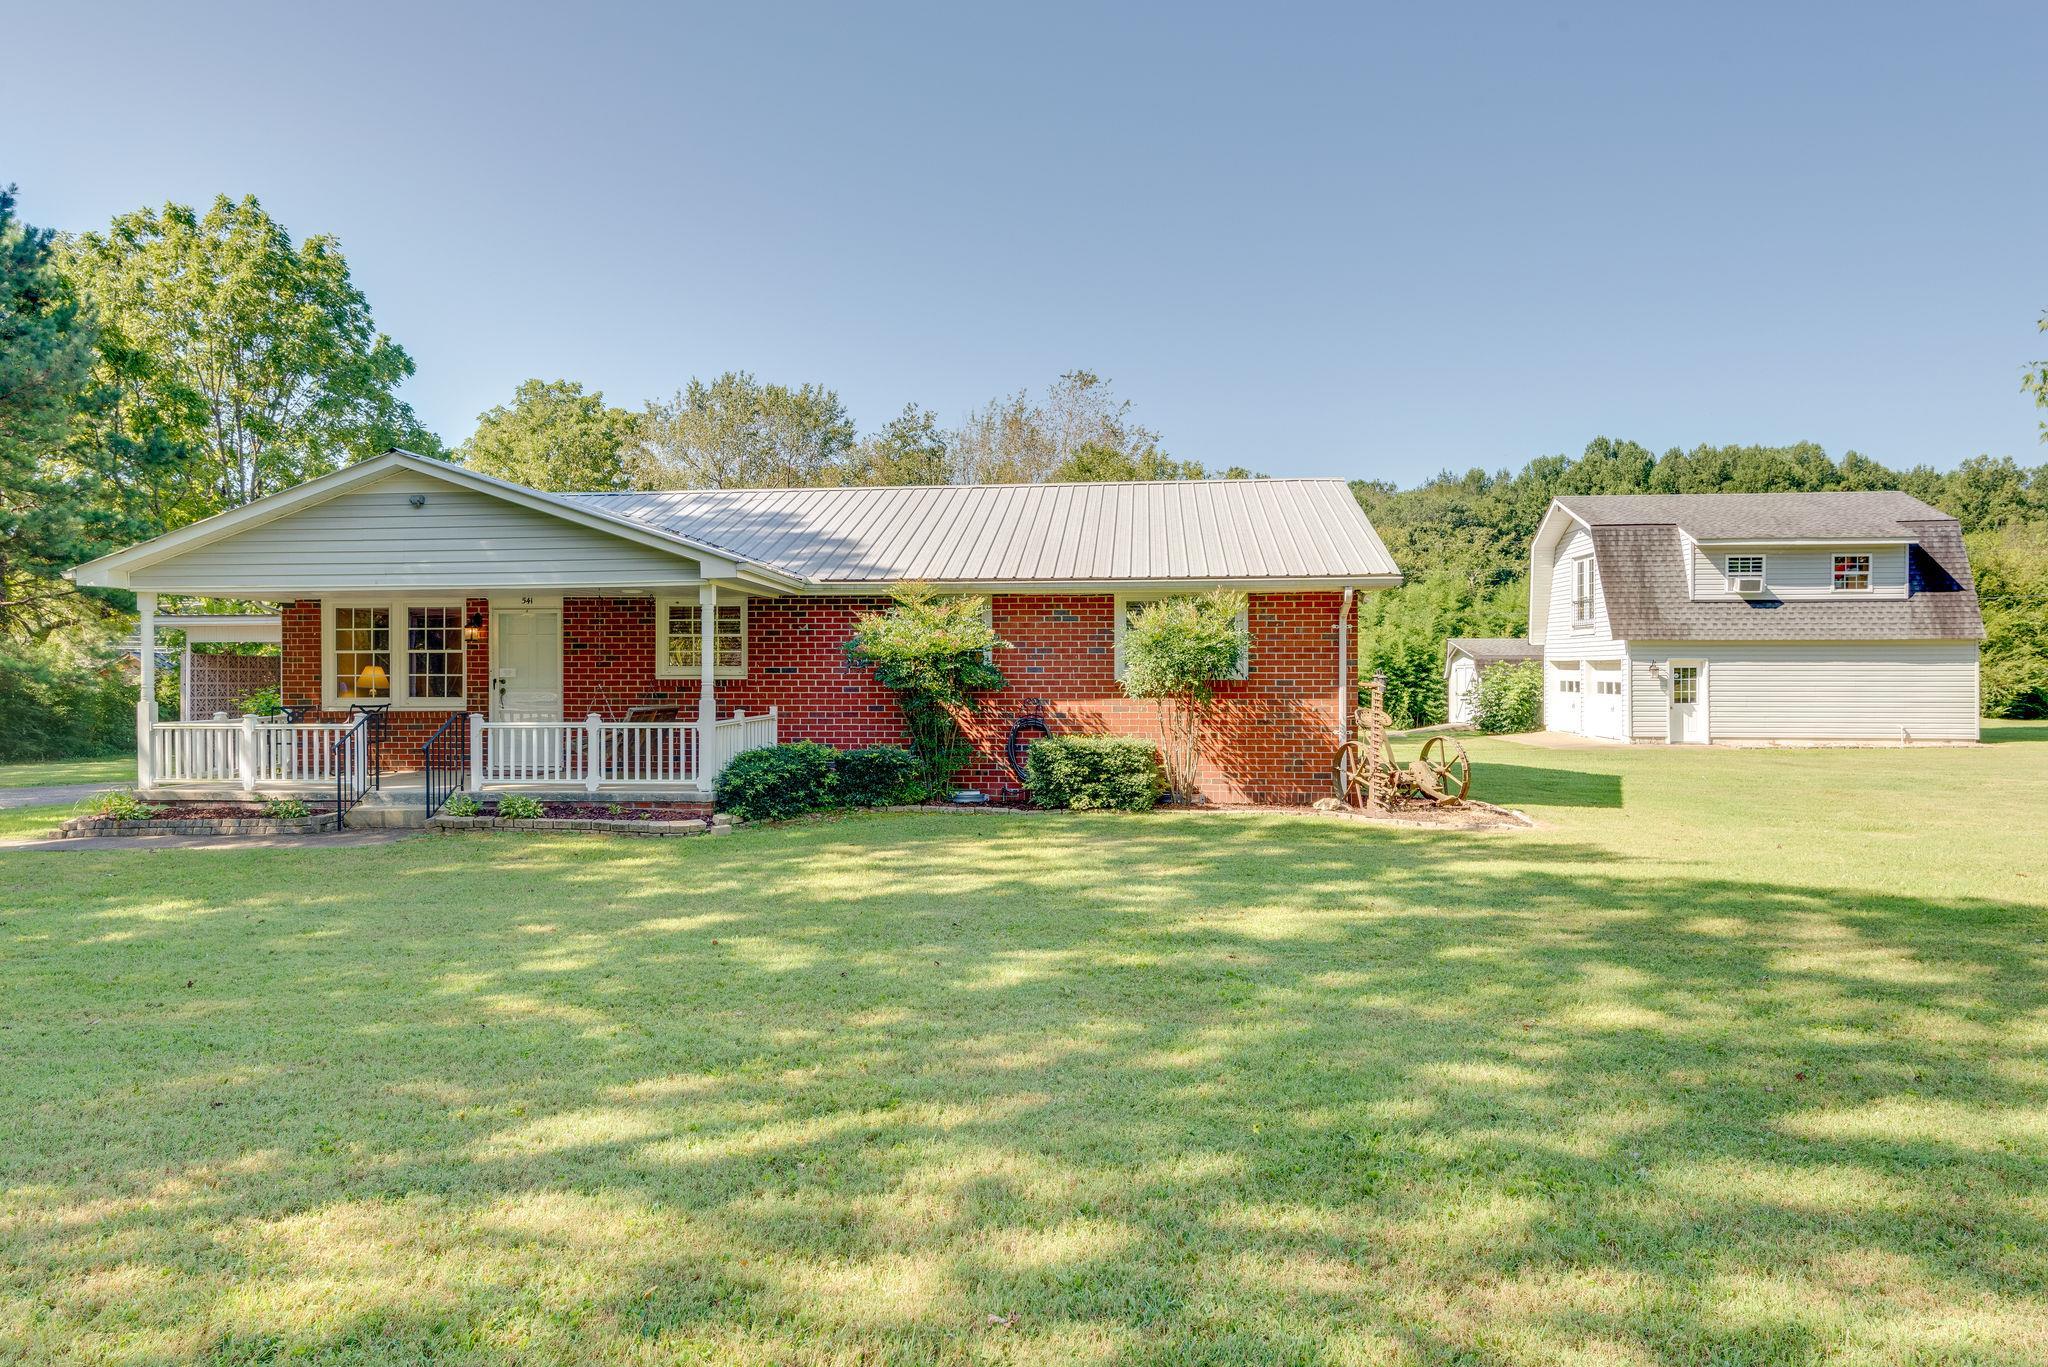 541 Juniper Dr, Pegram, TN 37143 - Pegram, TN real estate listing